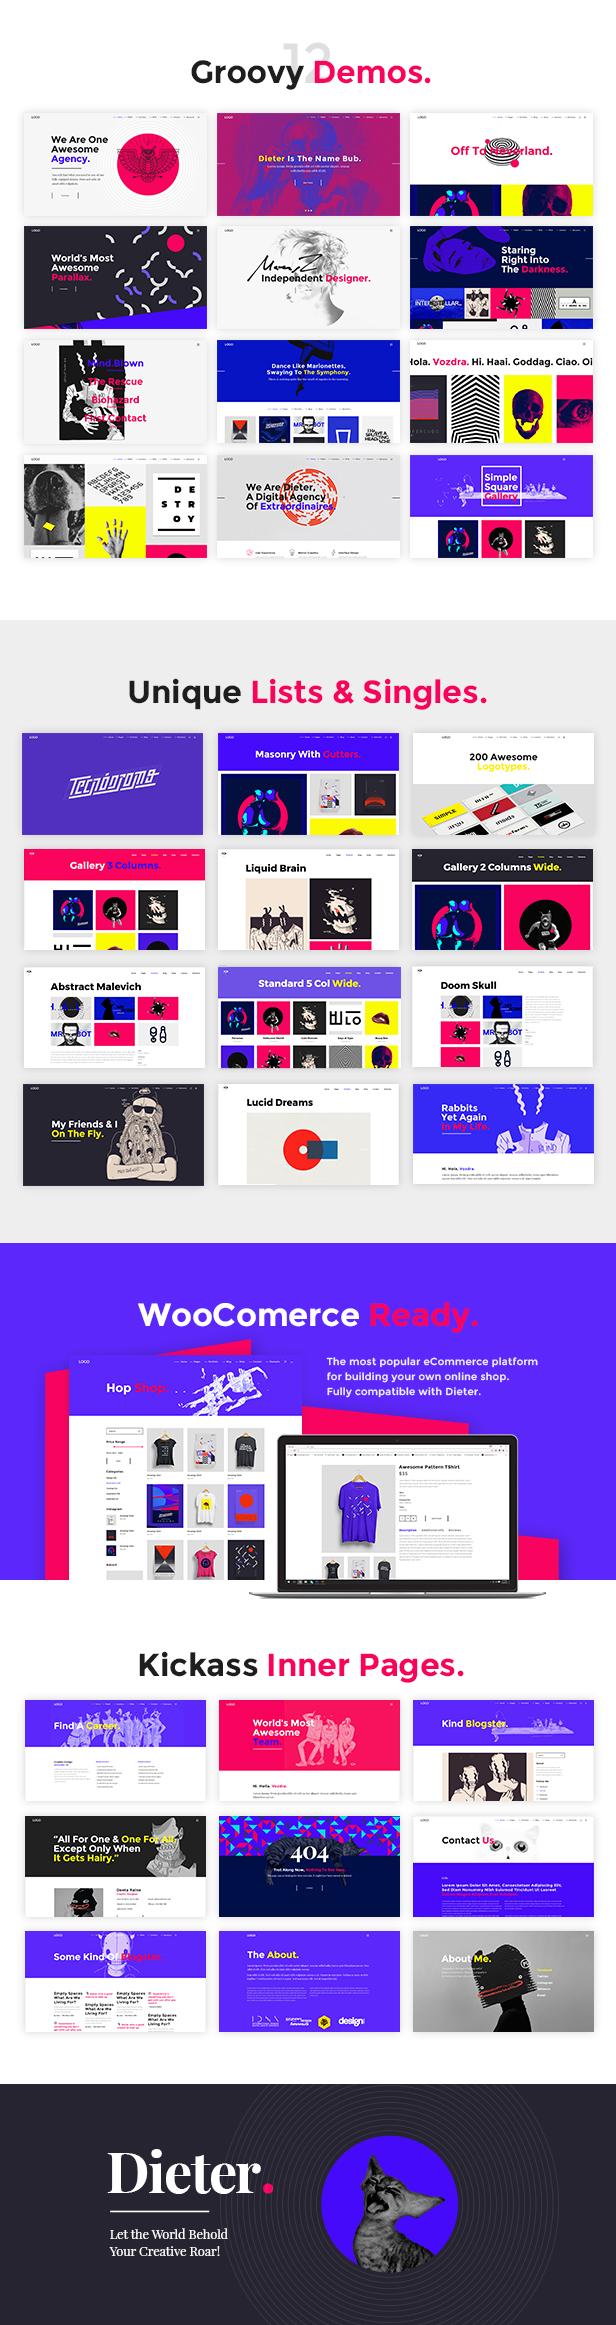 Dieter - Authentic Artist & Creative Design Agency Theme - 1